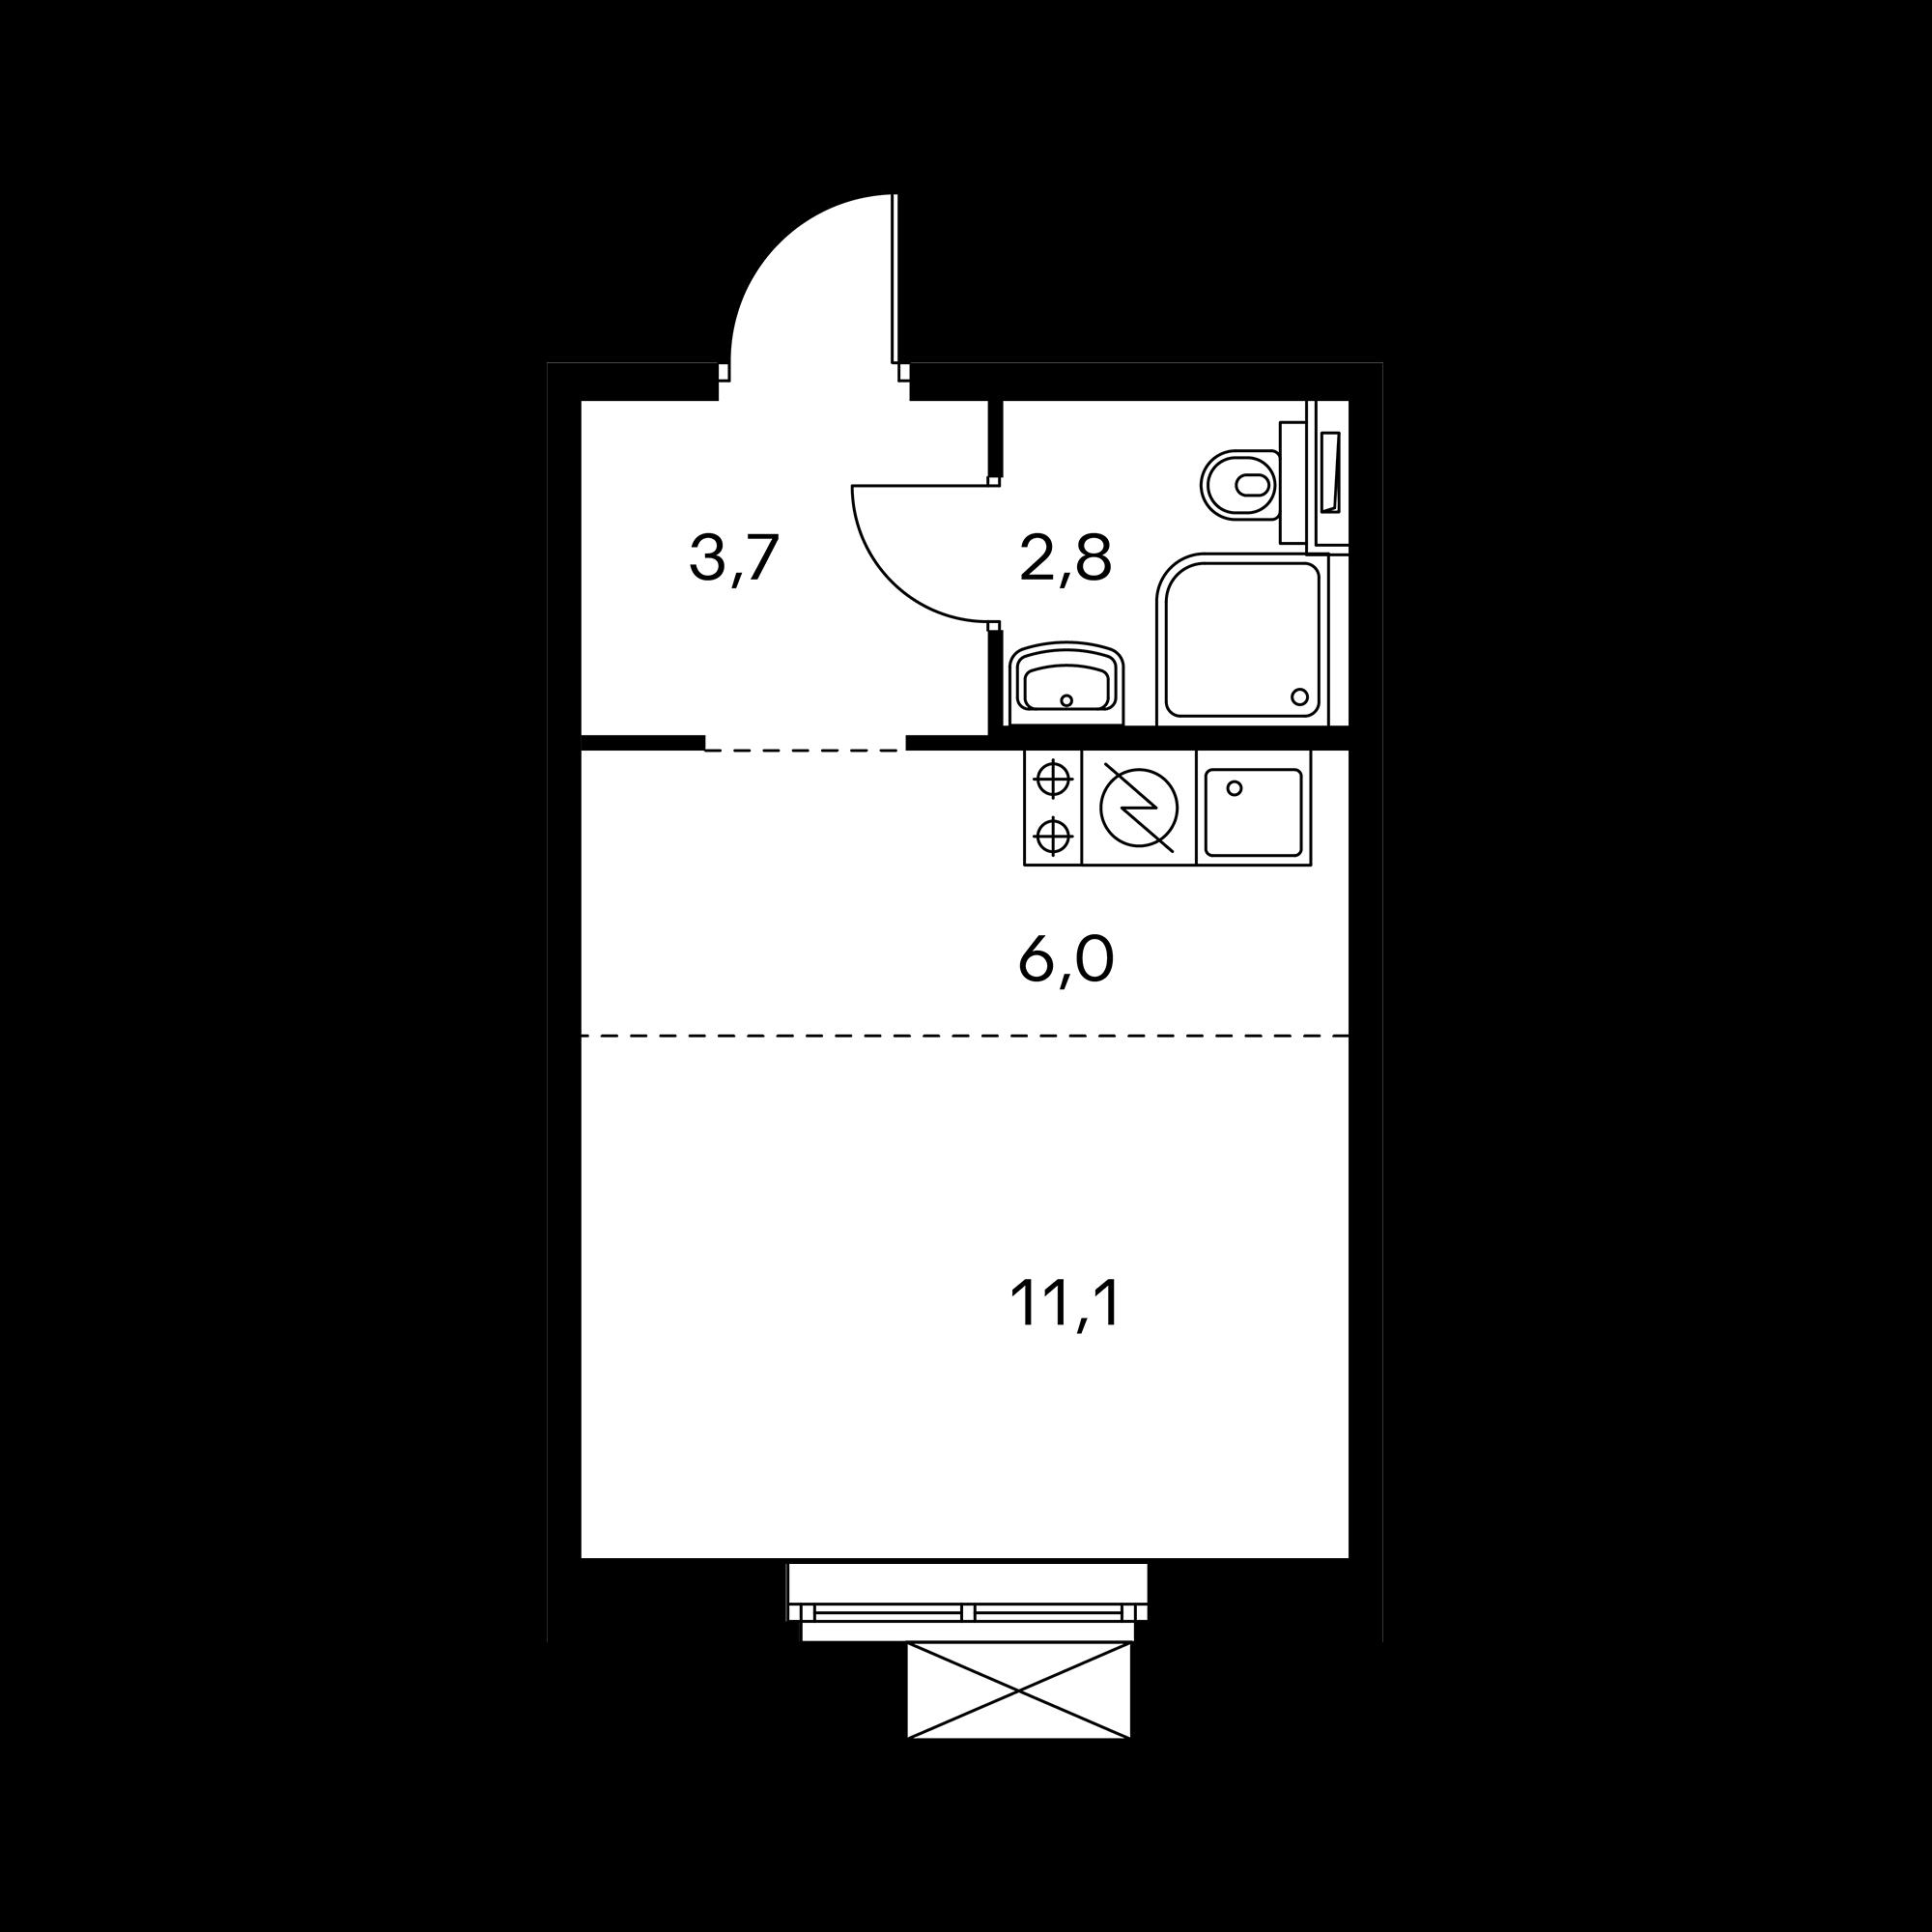 1NS1_4.2-1_2